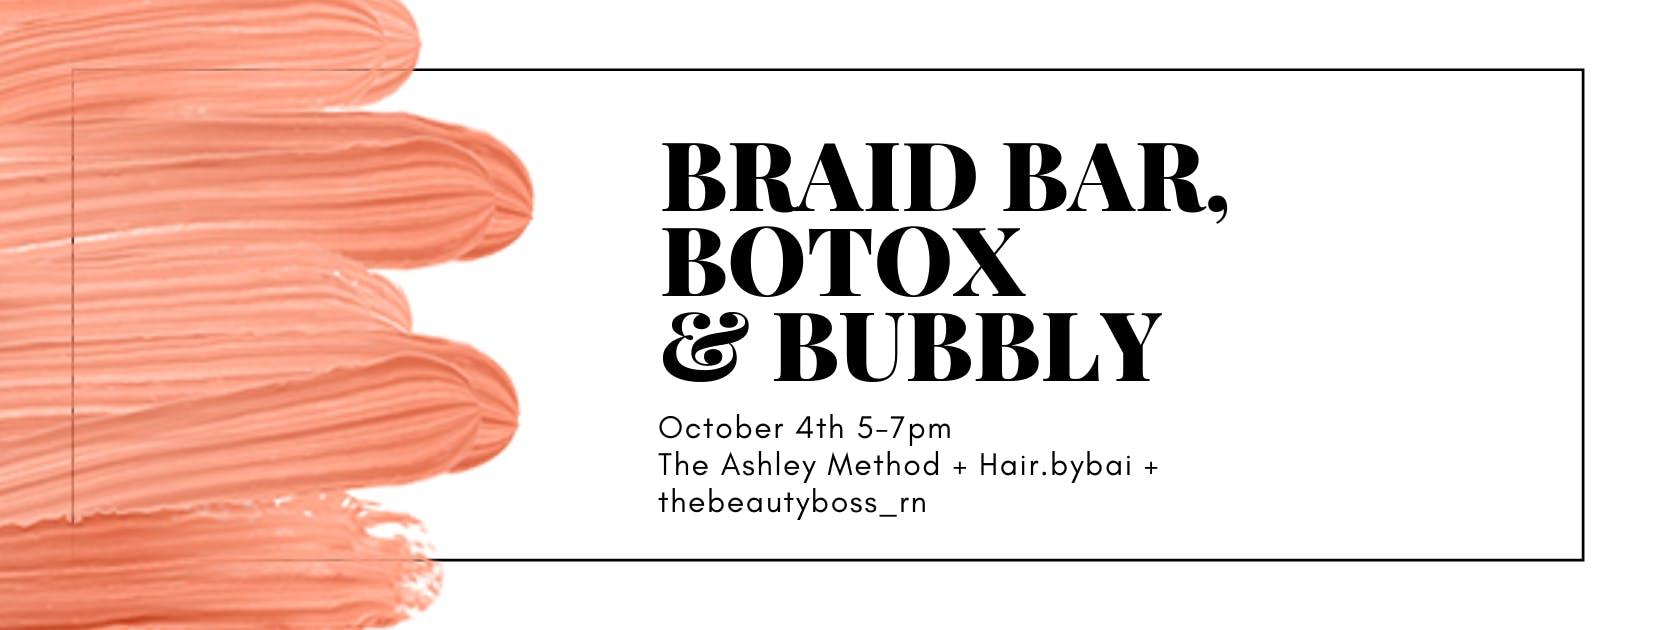 Braid Bar, Botox & Bubbly